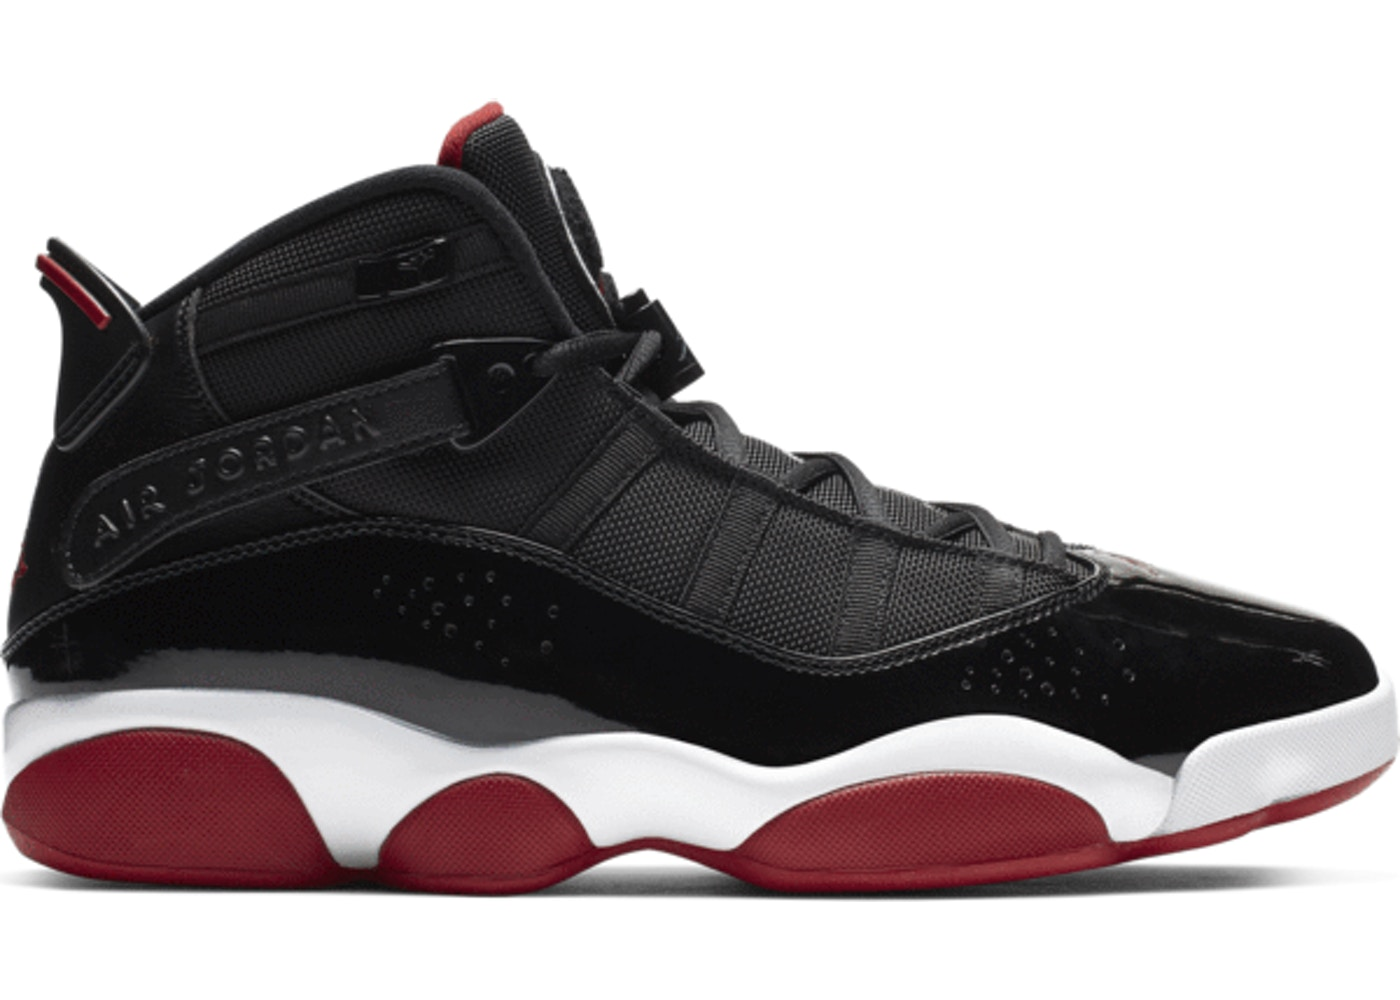 purchase cheap ab0f4 82bf1 Jordan 6 Rings Black Varsity Red